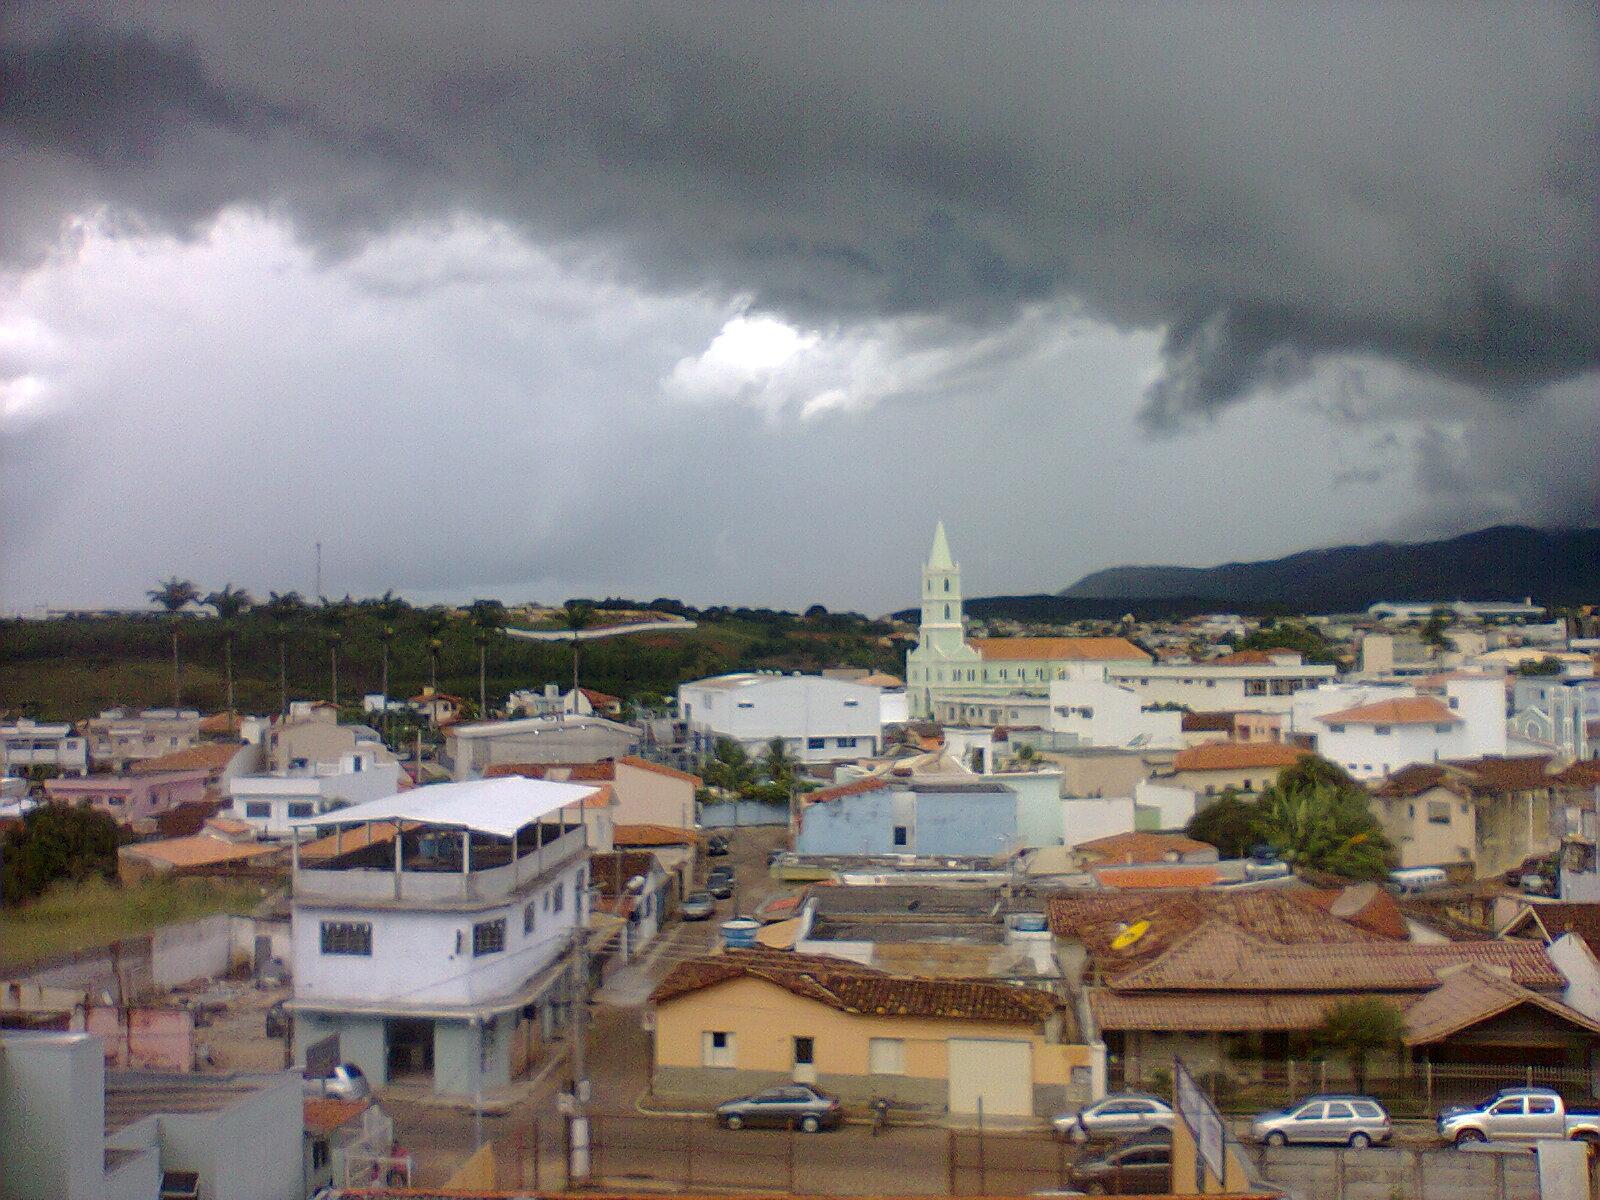 Piumhi Minas Gerais fonte: upload.wikimedia.org